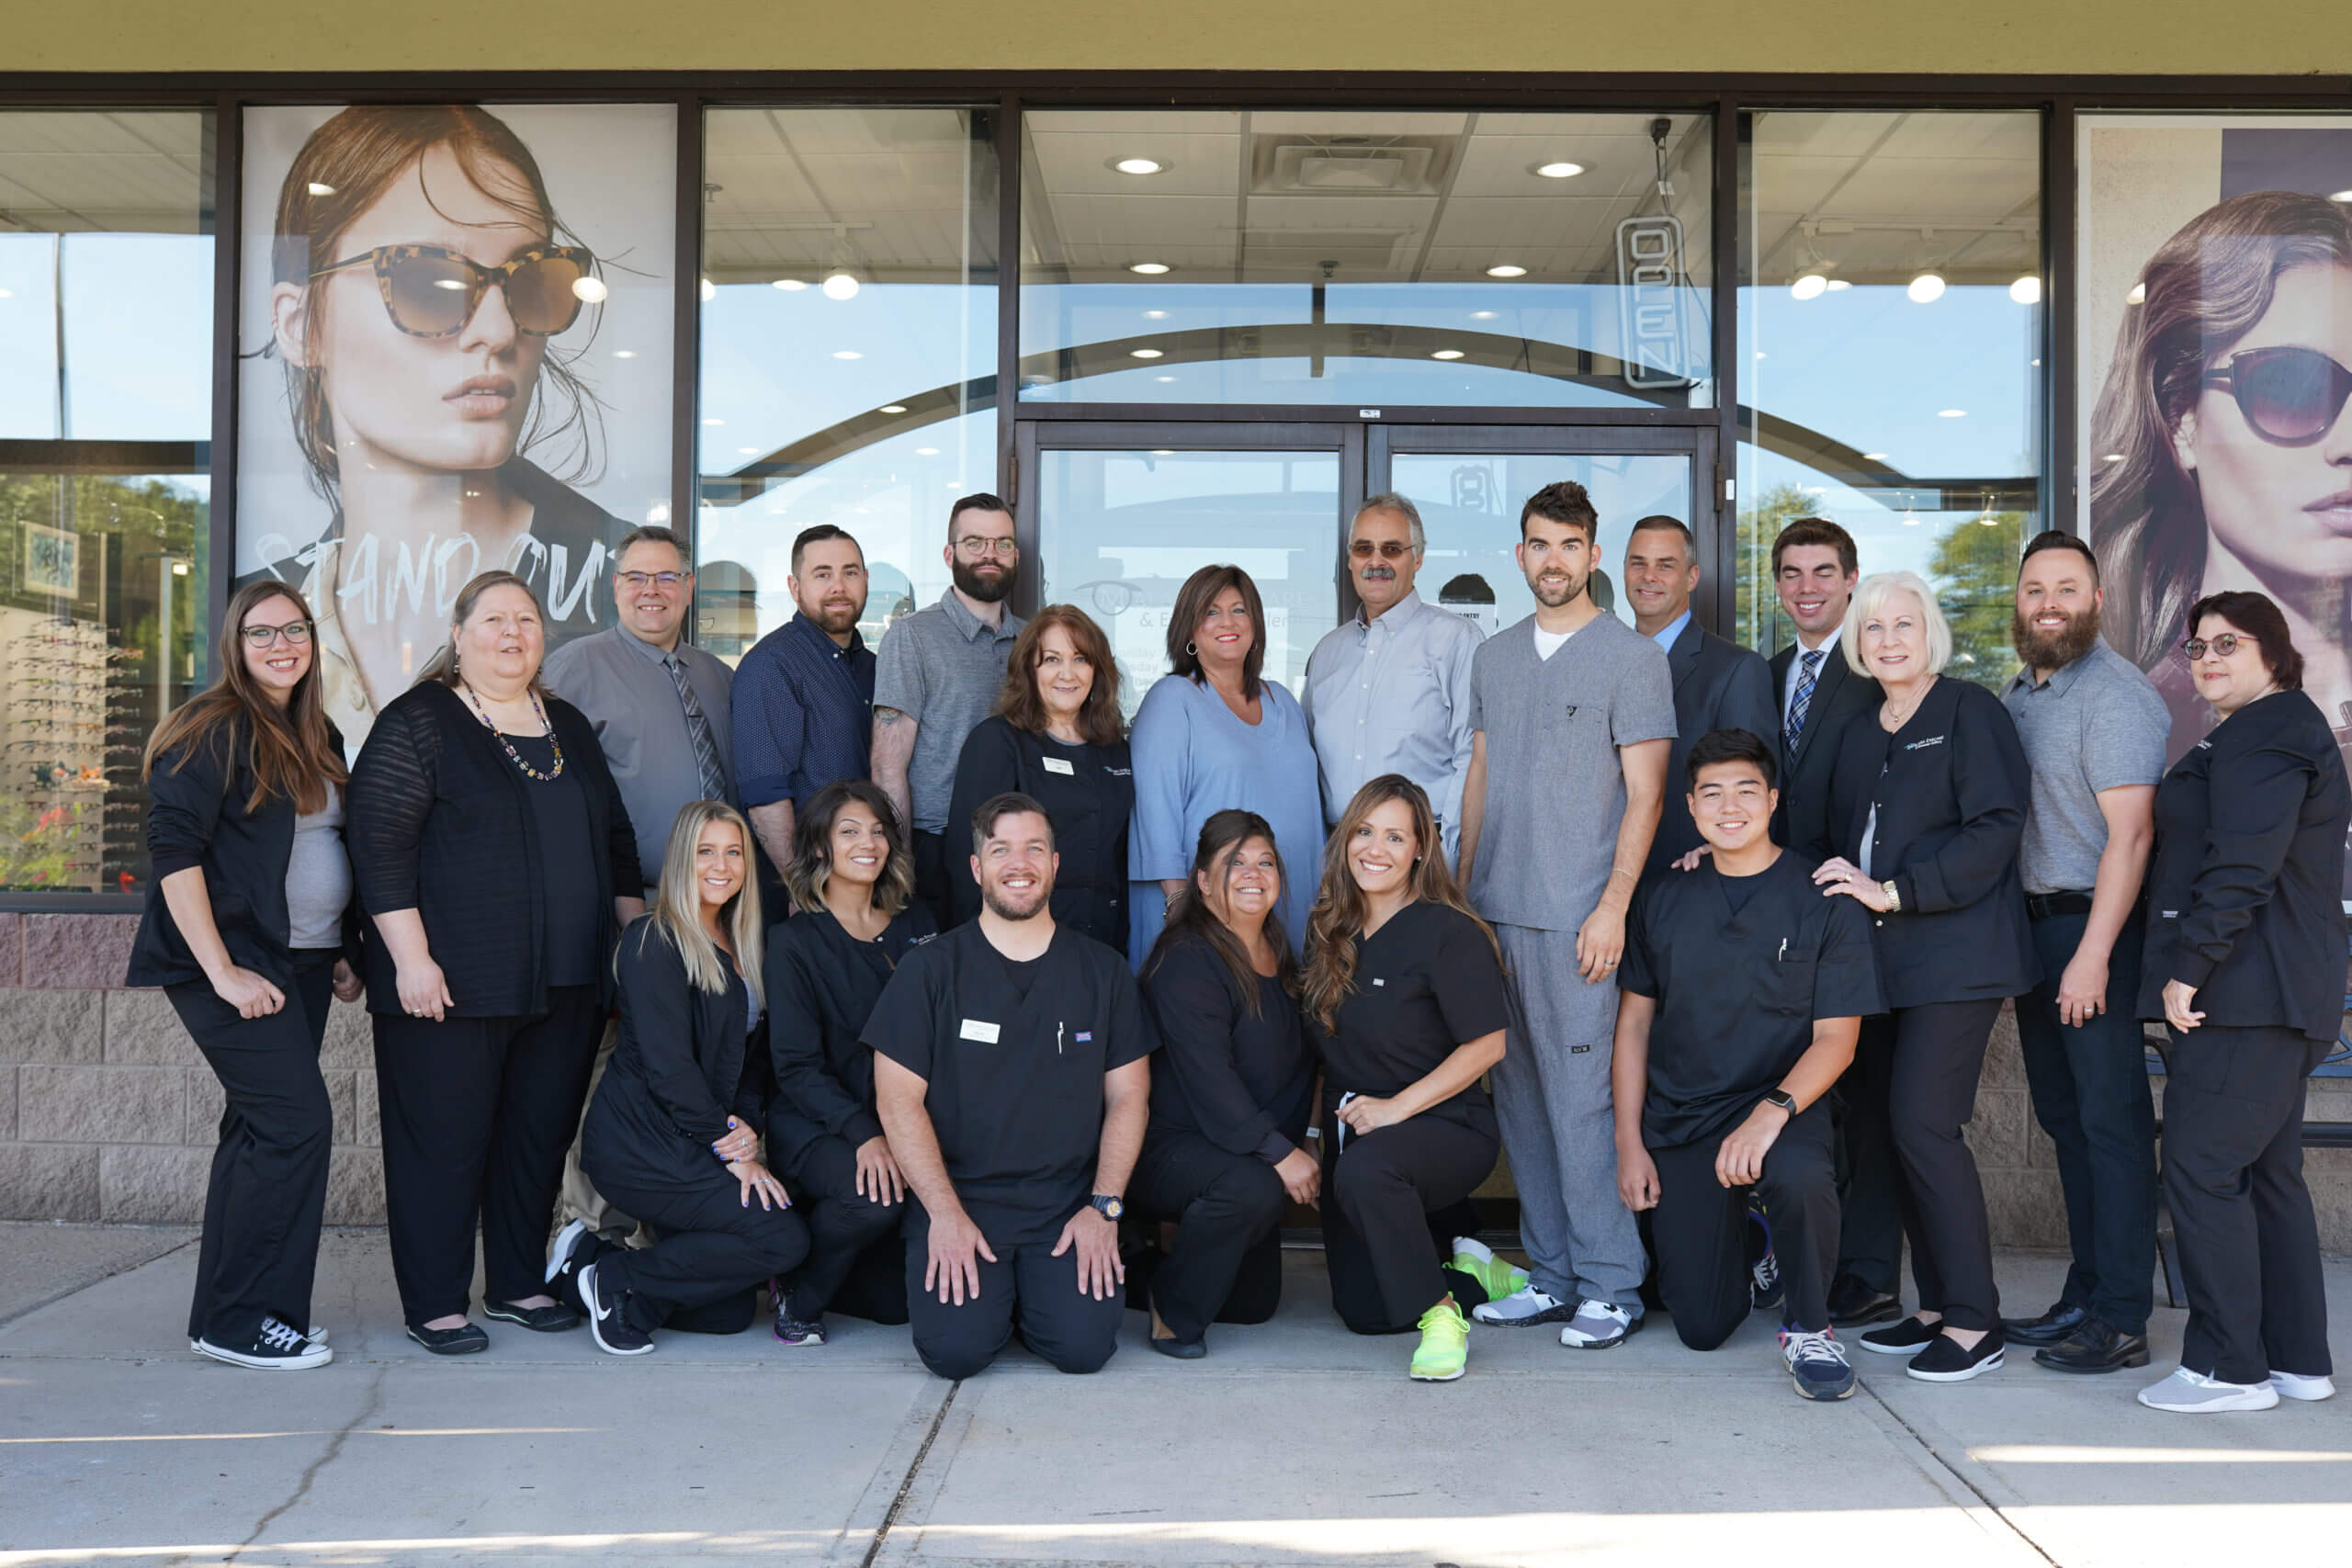 optometrist and staff at Malara Eyecare & Eyewear Gallery in Liverpool